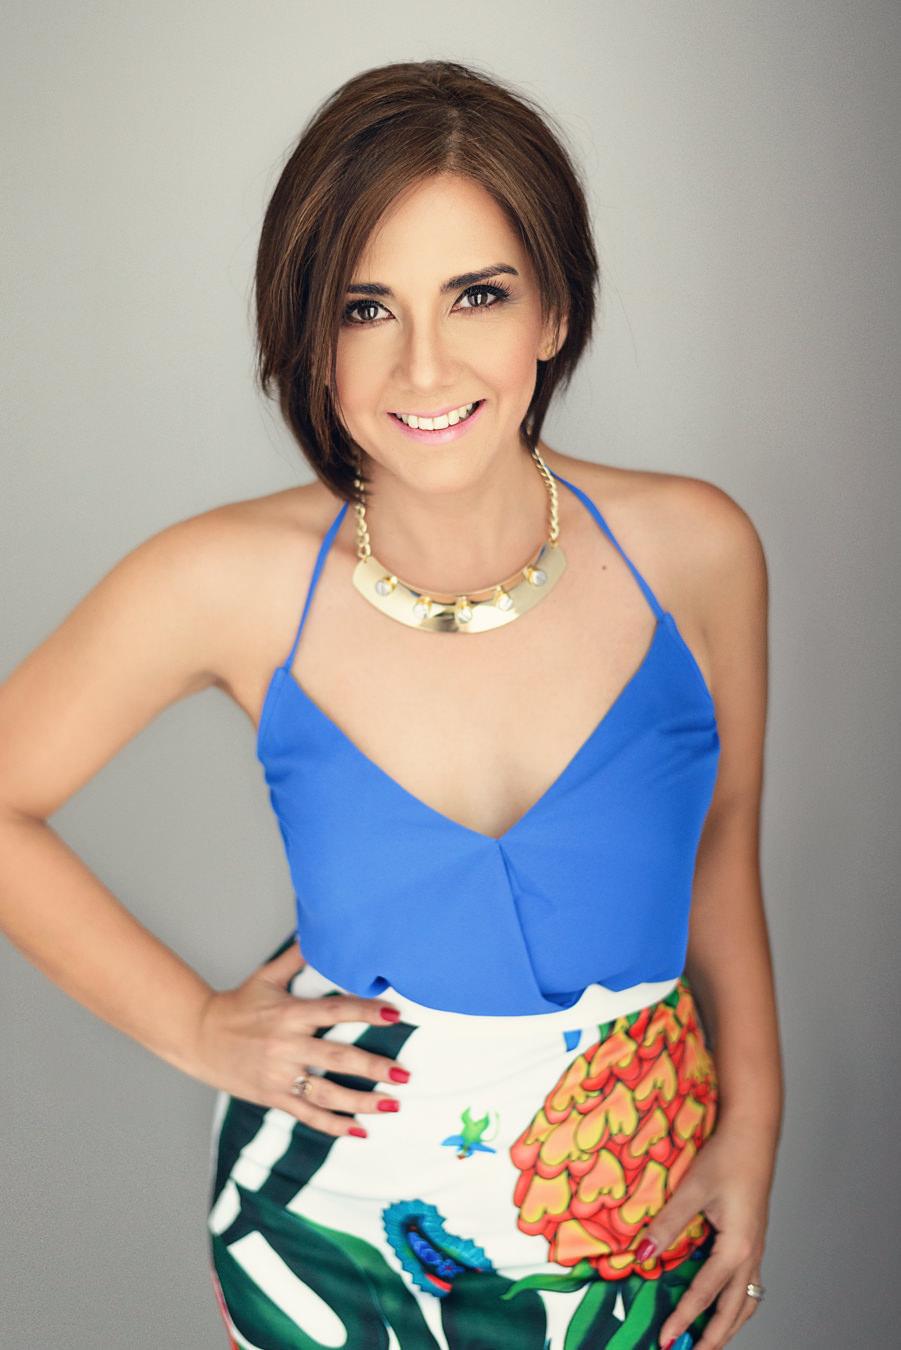 Annabeli Aguirre-Melissa Alcantar Fotografía-Sesión de fotos en Mexicali